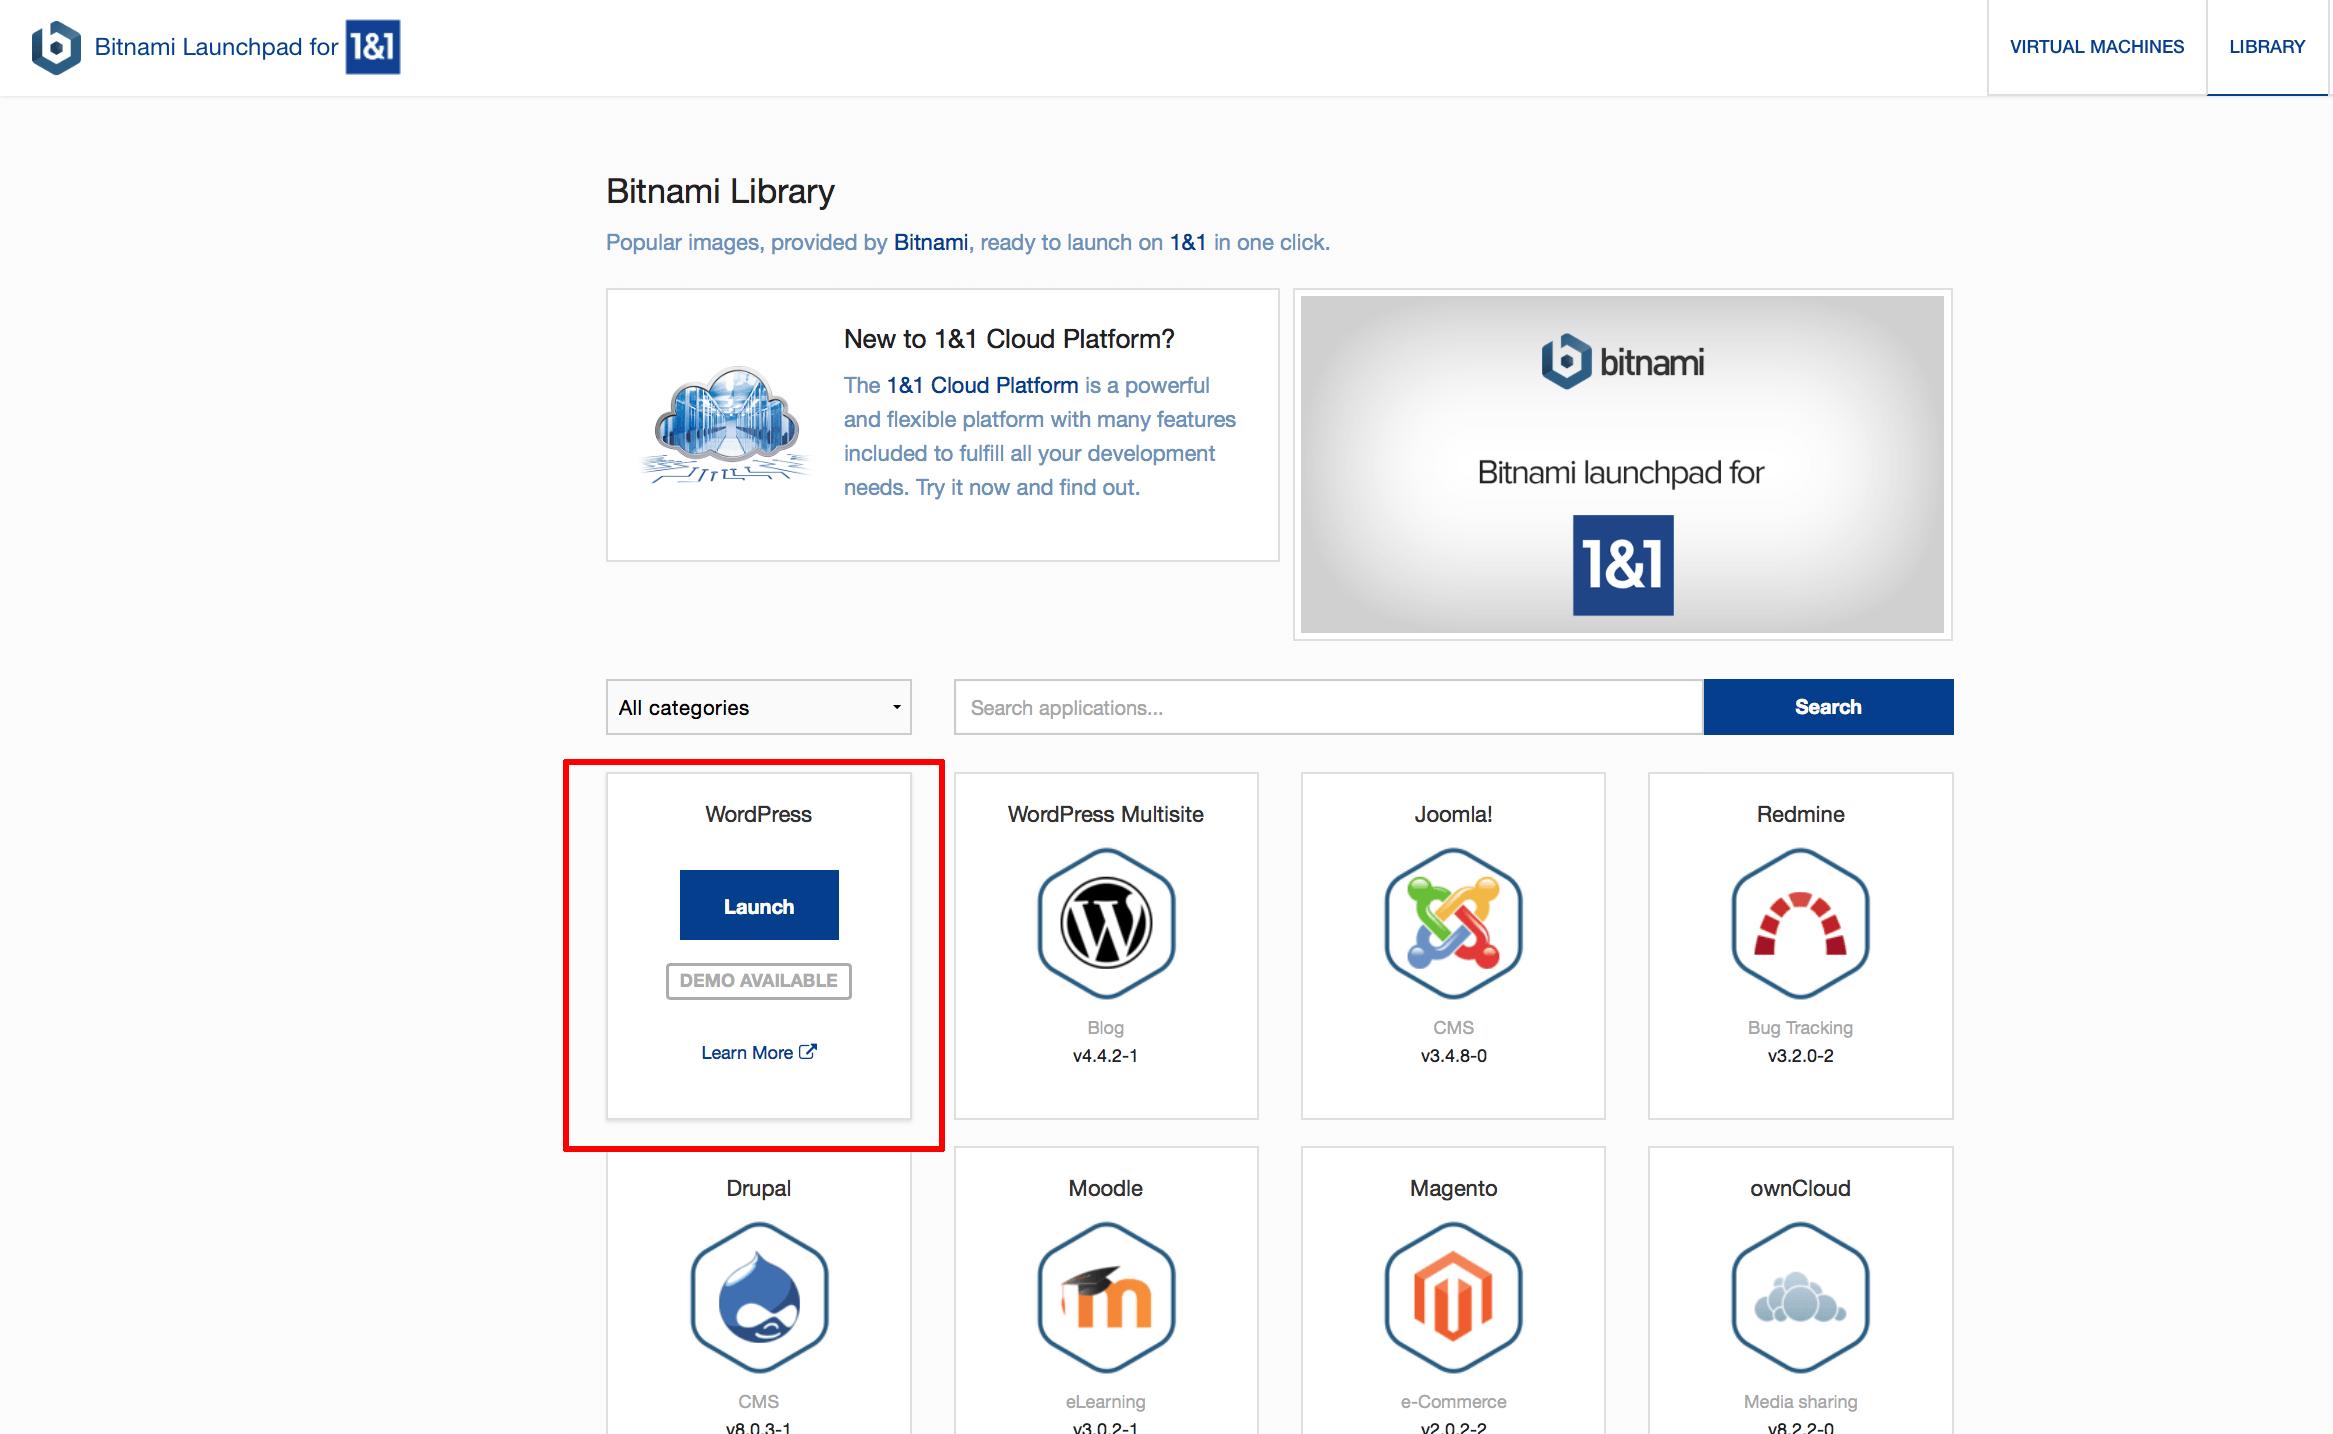 Bitnami Launchpad usage